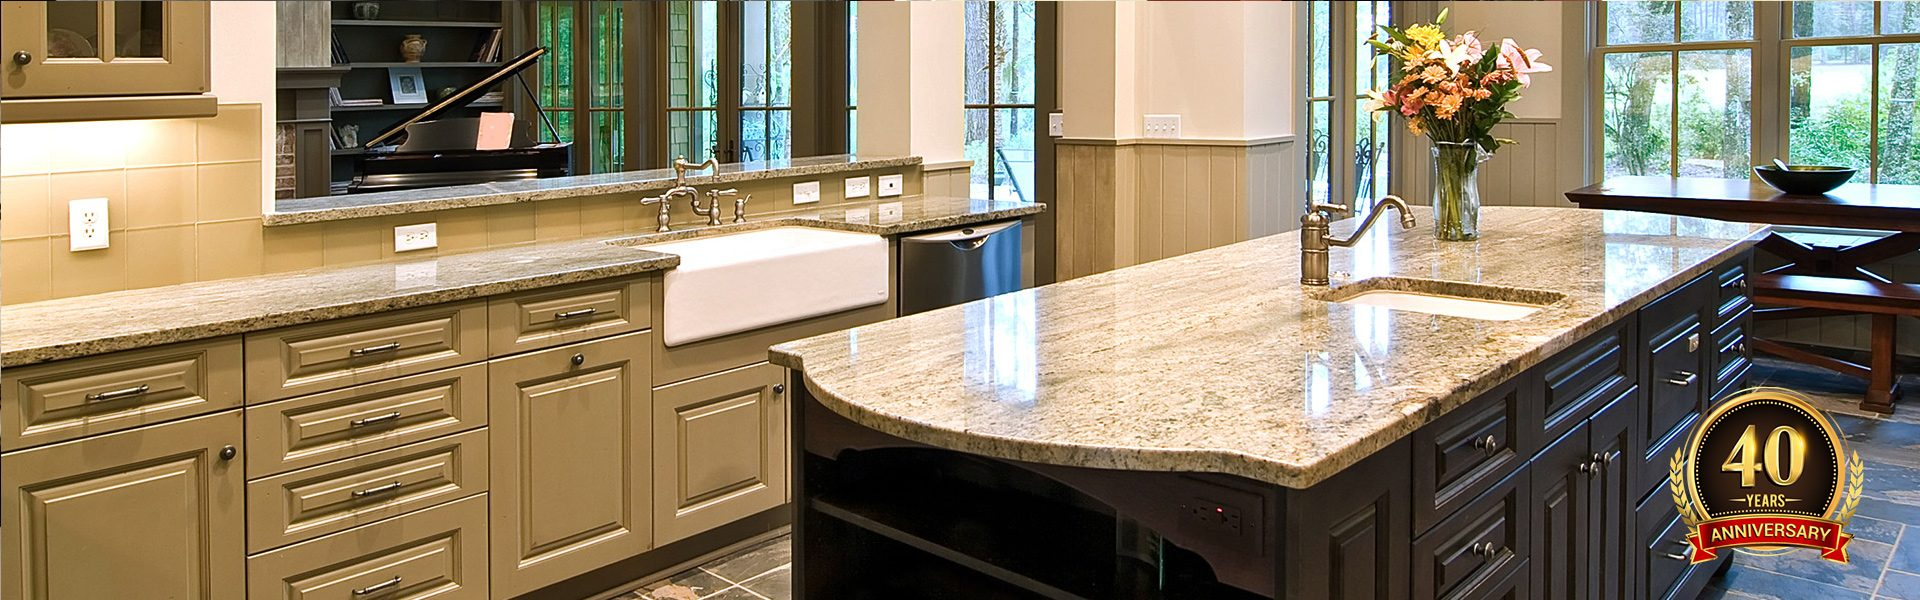 Custom Countertop Design, Fabrication U0026 Install   European Wholesale  Countertops